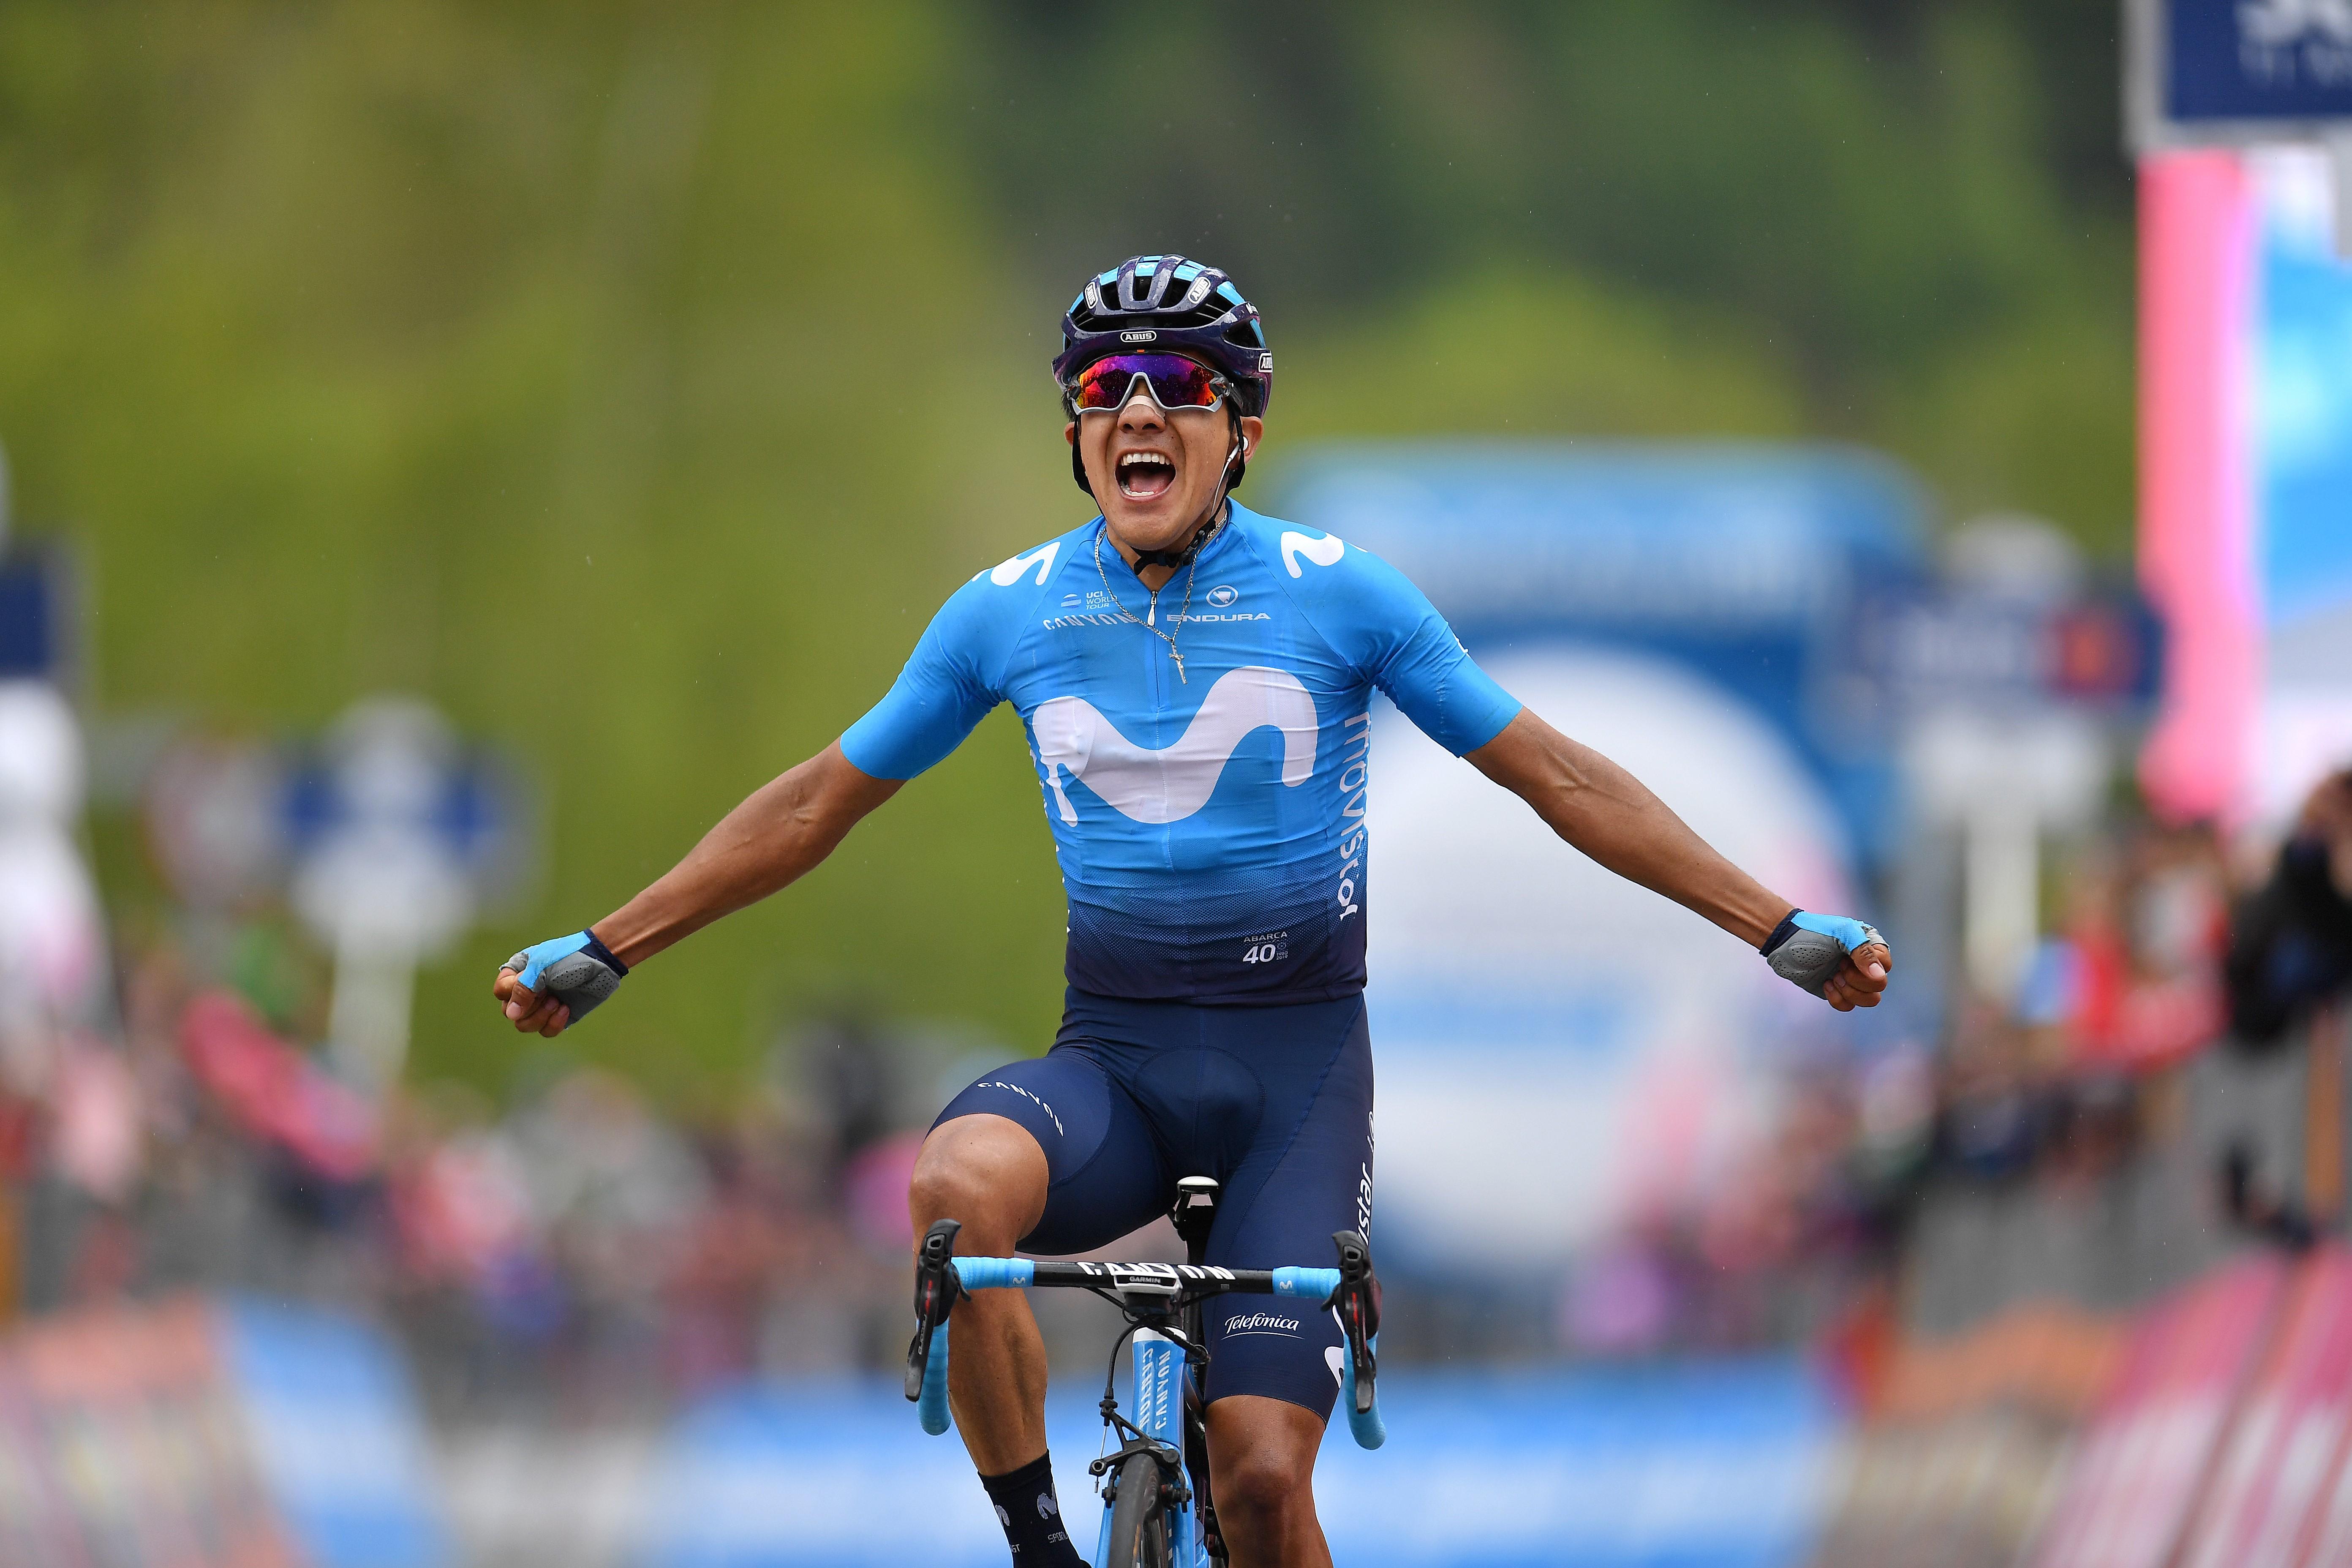 Richard Carapaz, Movistar, Giro 2019 14. Etap